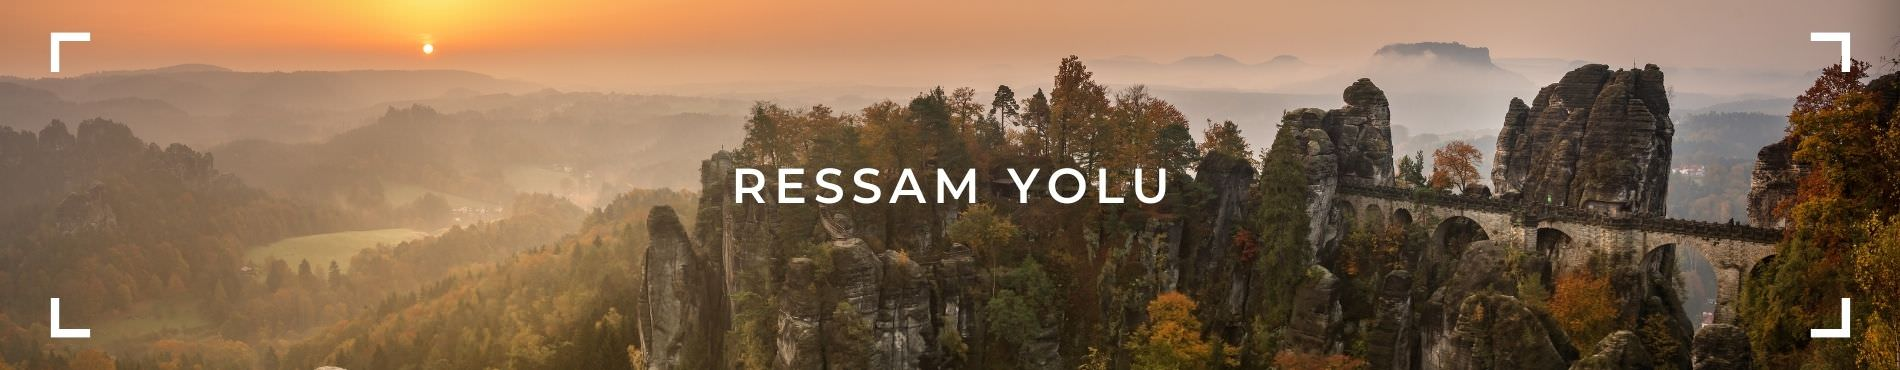 RESSAM YOLU